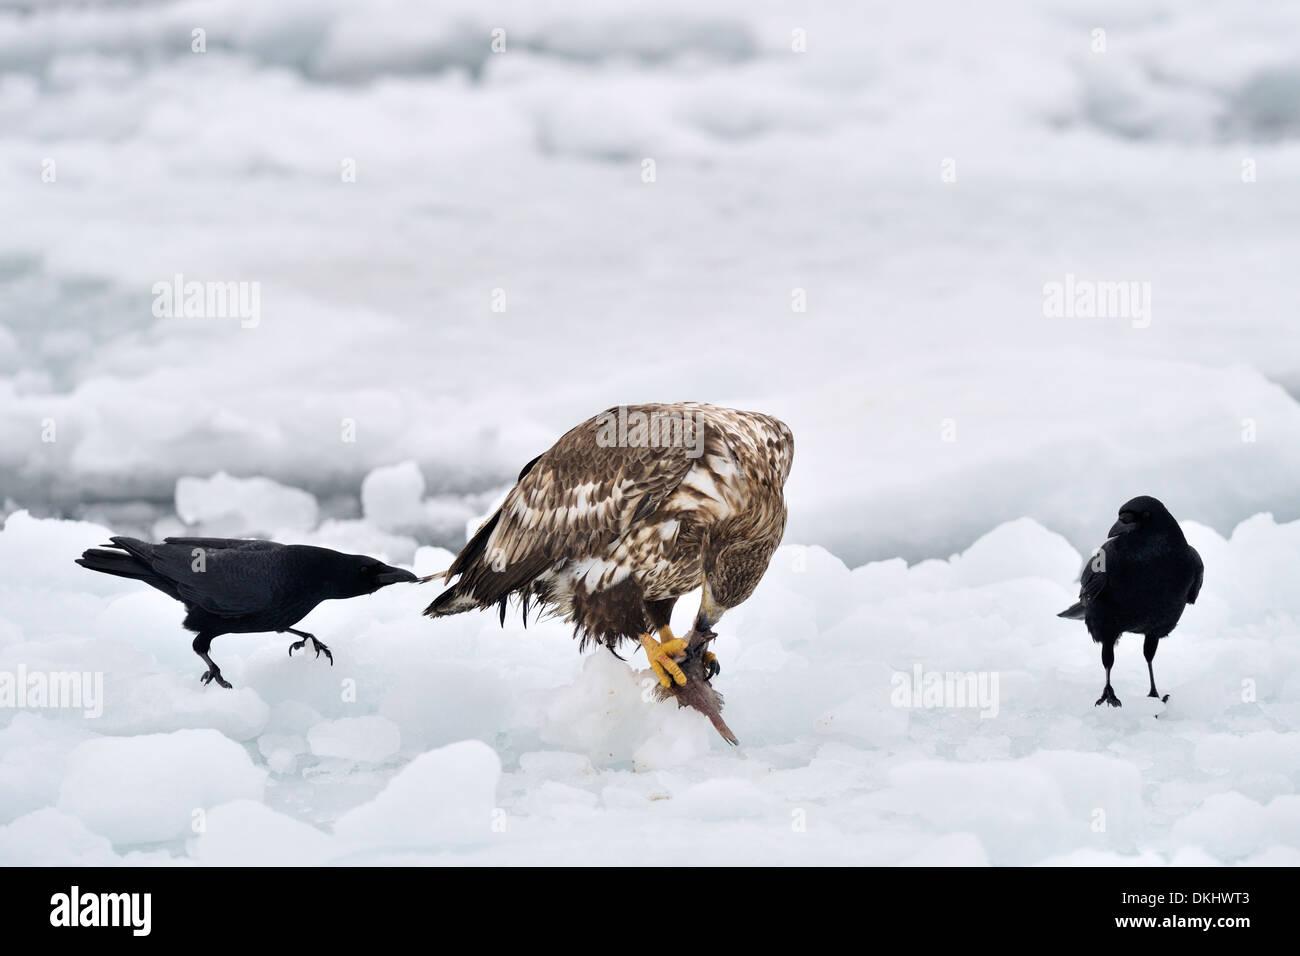 Crows (Corvus corone) tryng to steel food from White-tailed Sea Eagle (Haliaeetus albicilla), Rausu, Hokkaido, Japan. Stock Photo